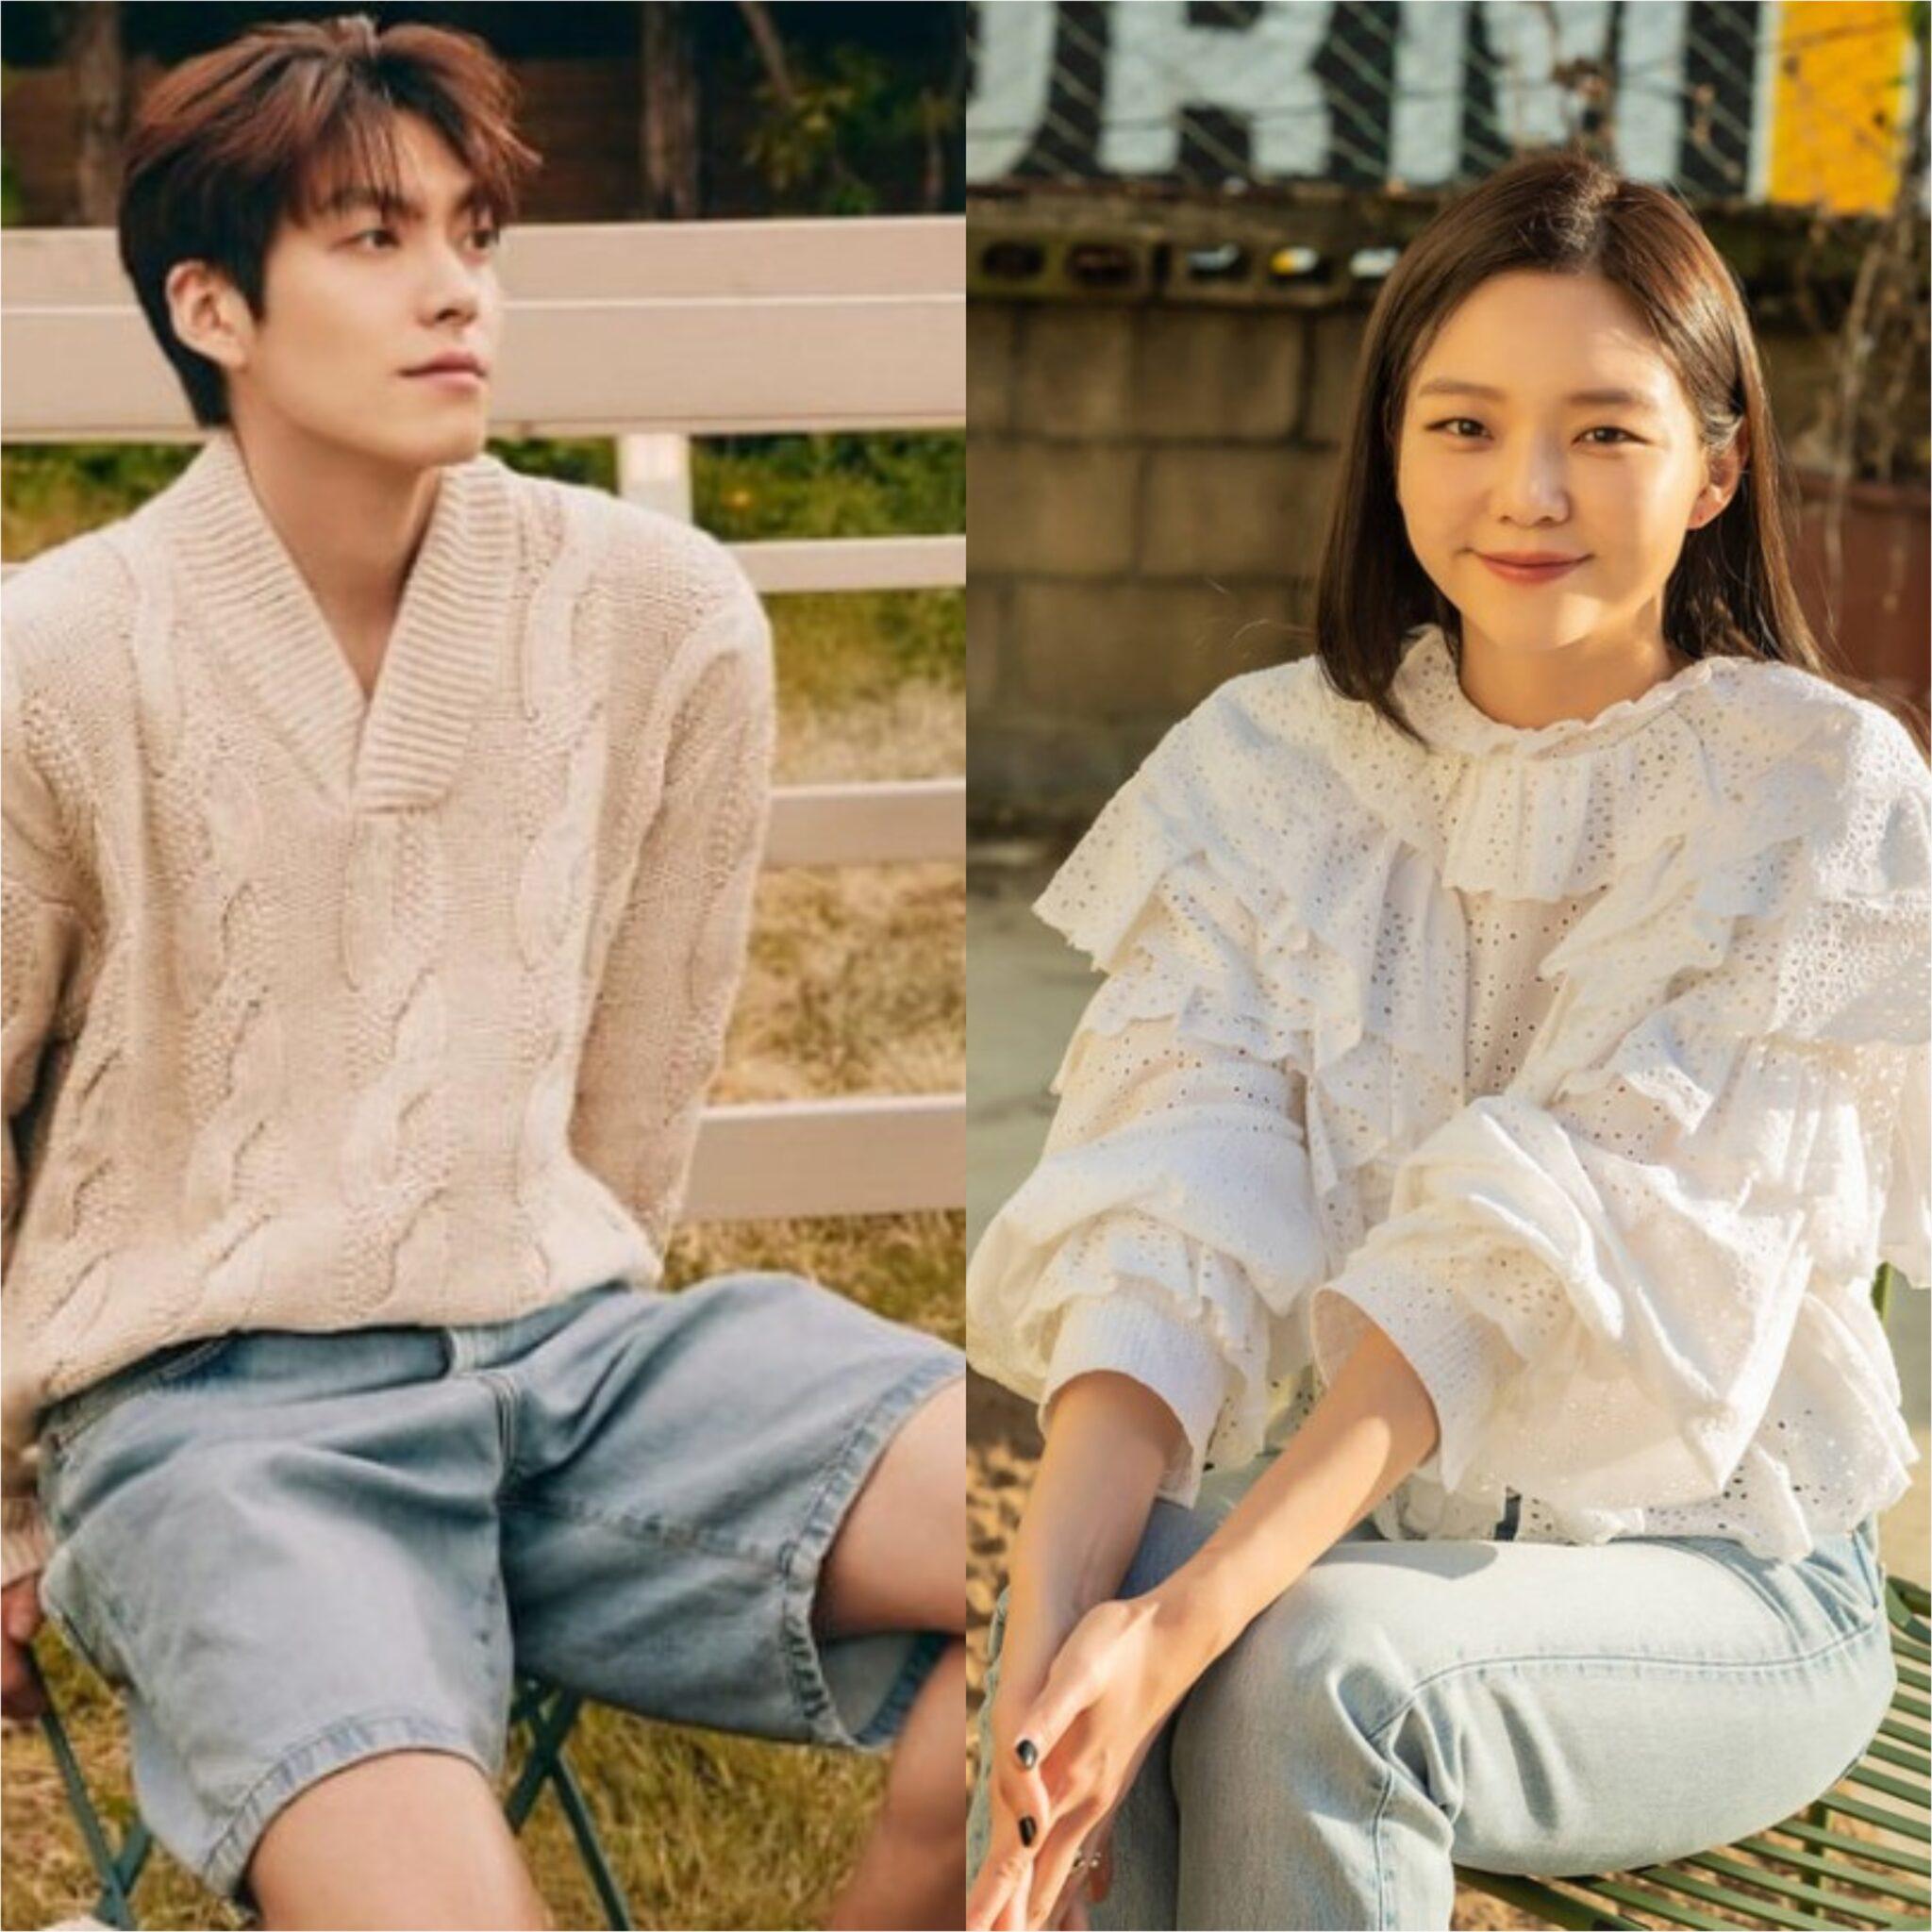 Esom and Kim Woo-bin in talks to star in new Netflix project